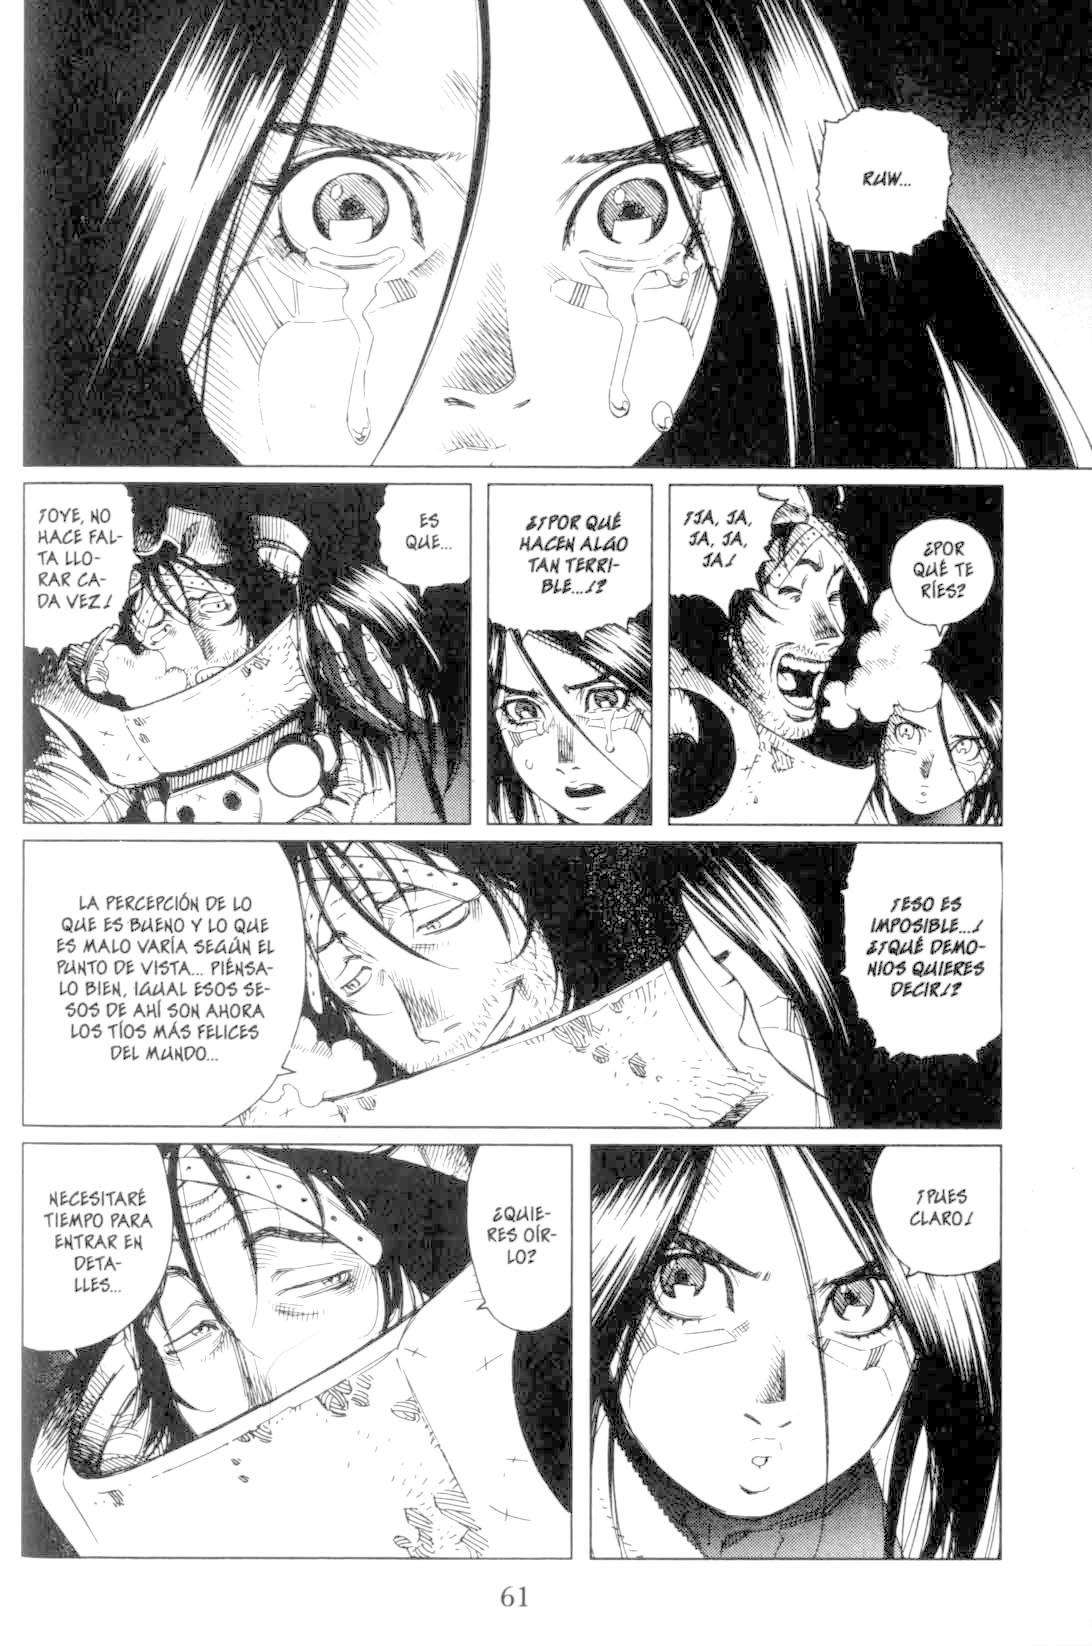 http://c5.ninemanga.com/es_manga/pic2/1/15873/523542/6acb9a31556eee1a13176130b92418d6.jpg Page 3